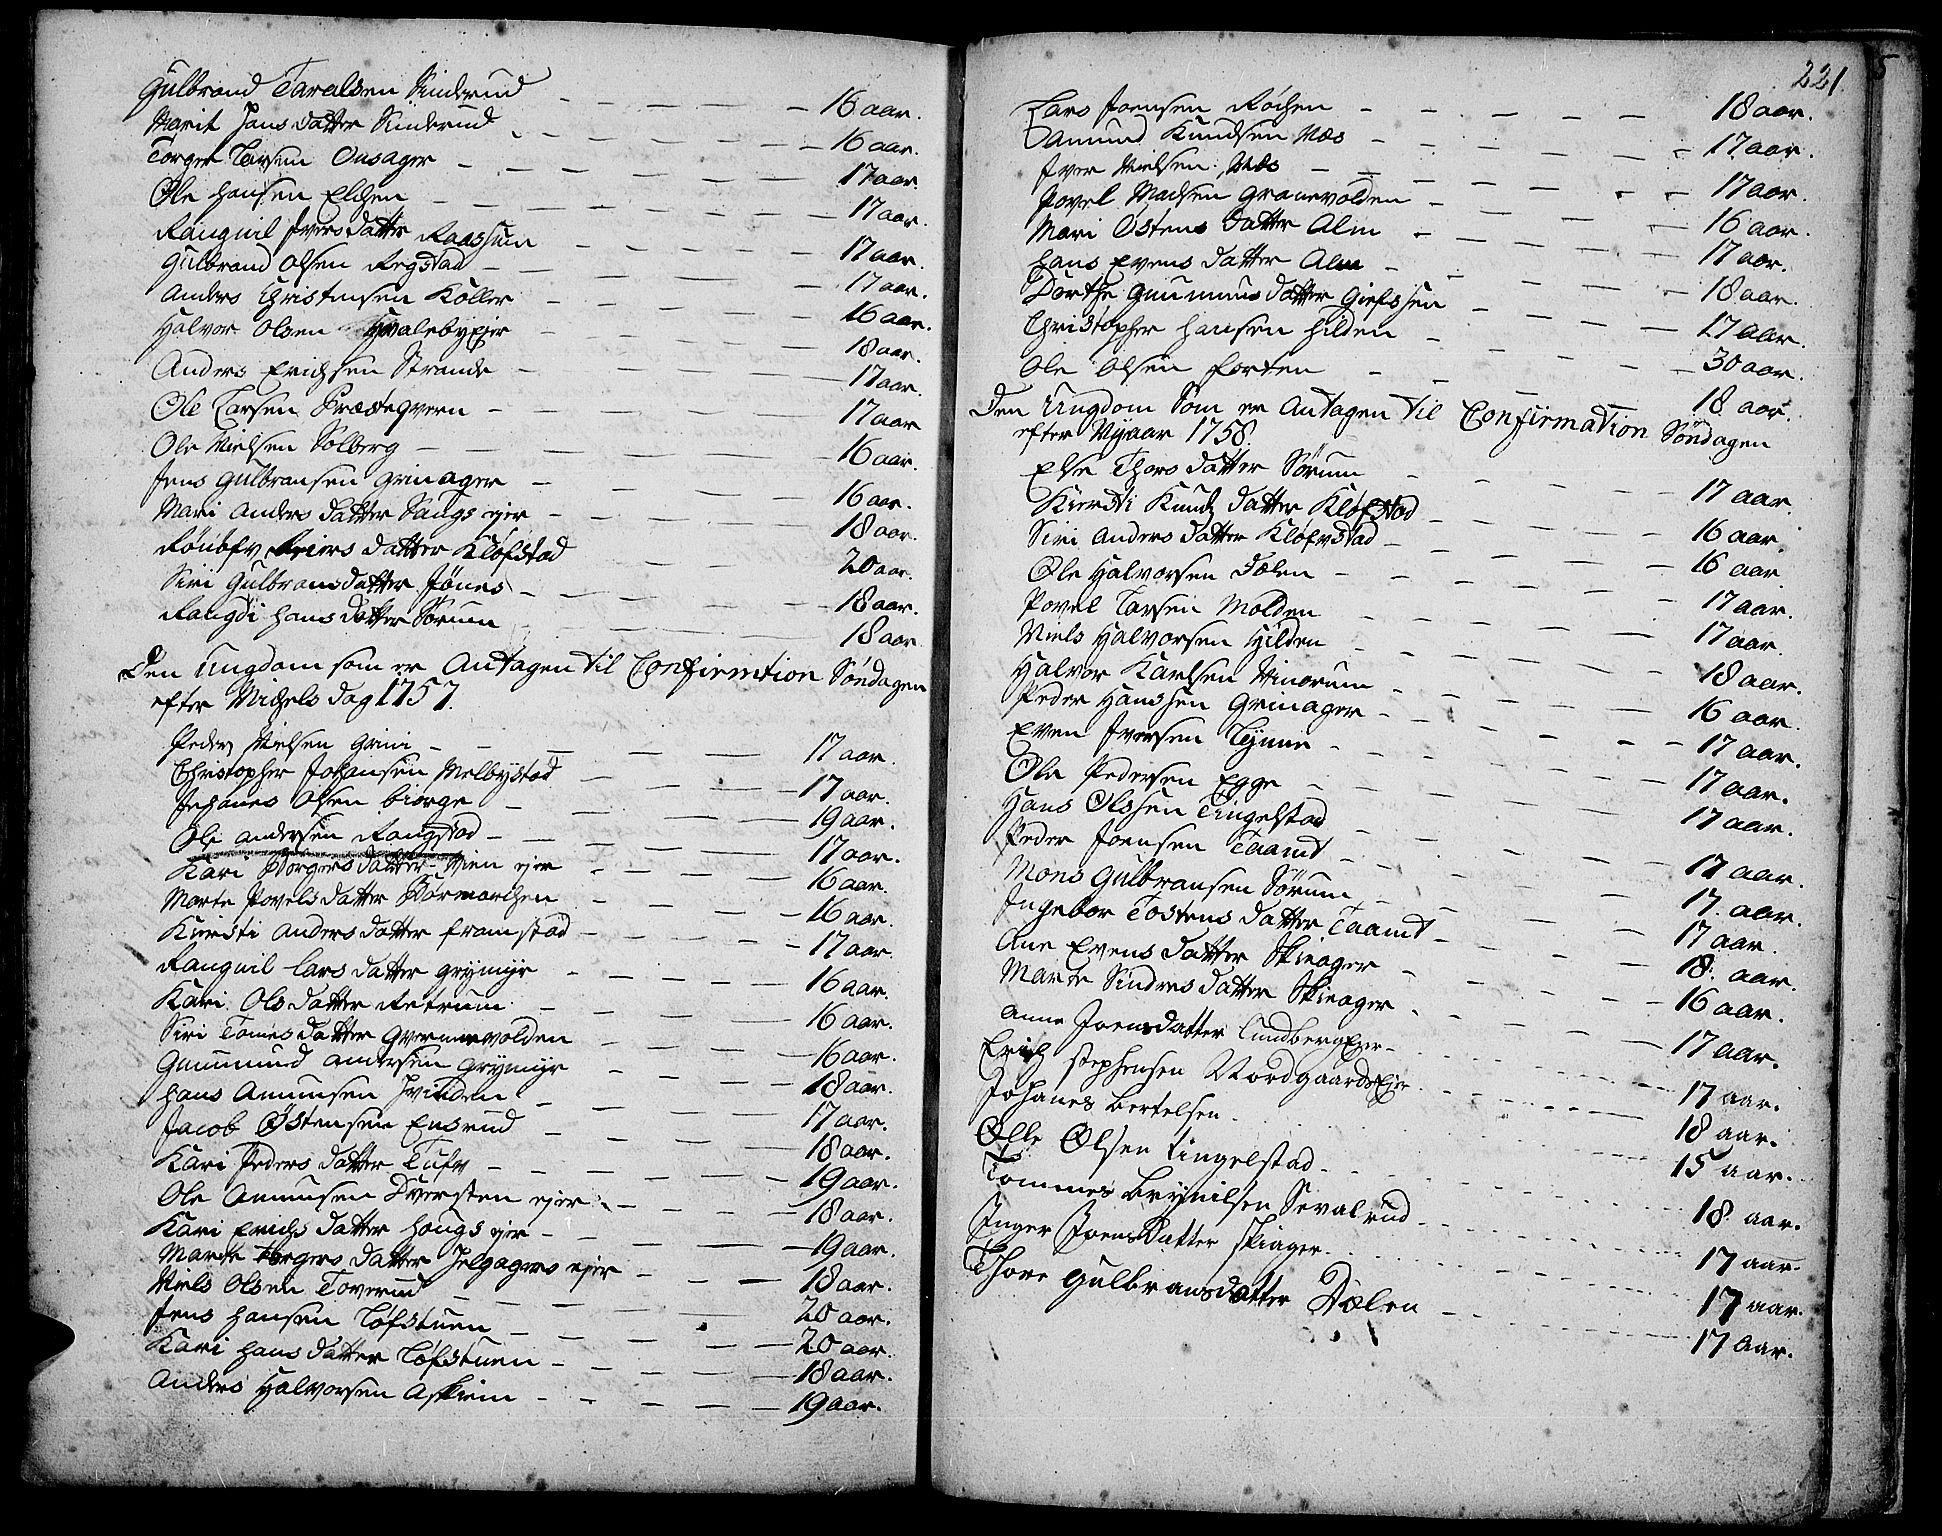 SAH, Gran prestekontor, Ministerialbok nr. 3, 1745-1758, s. 221